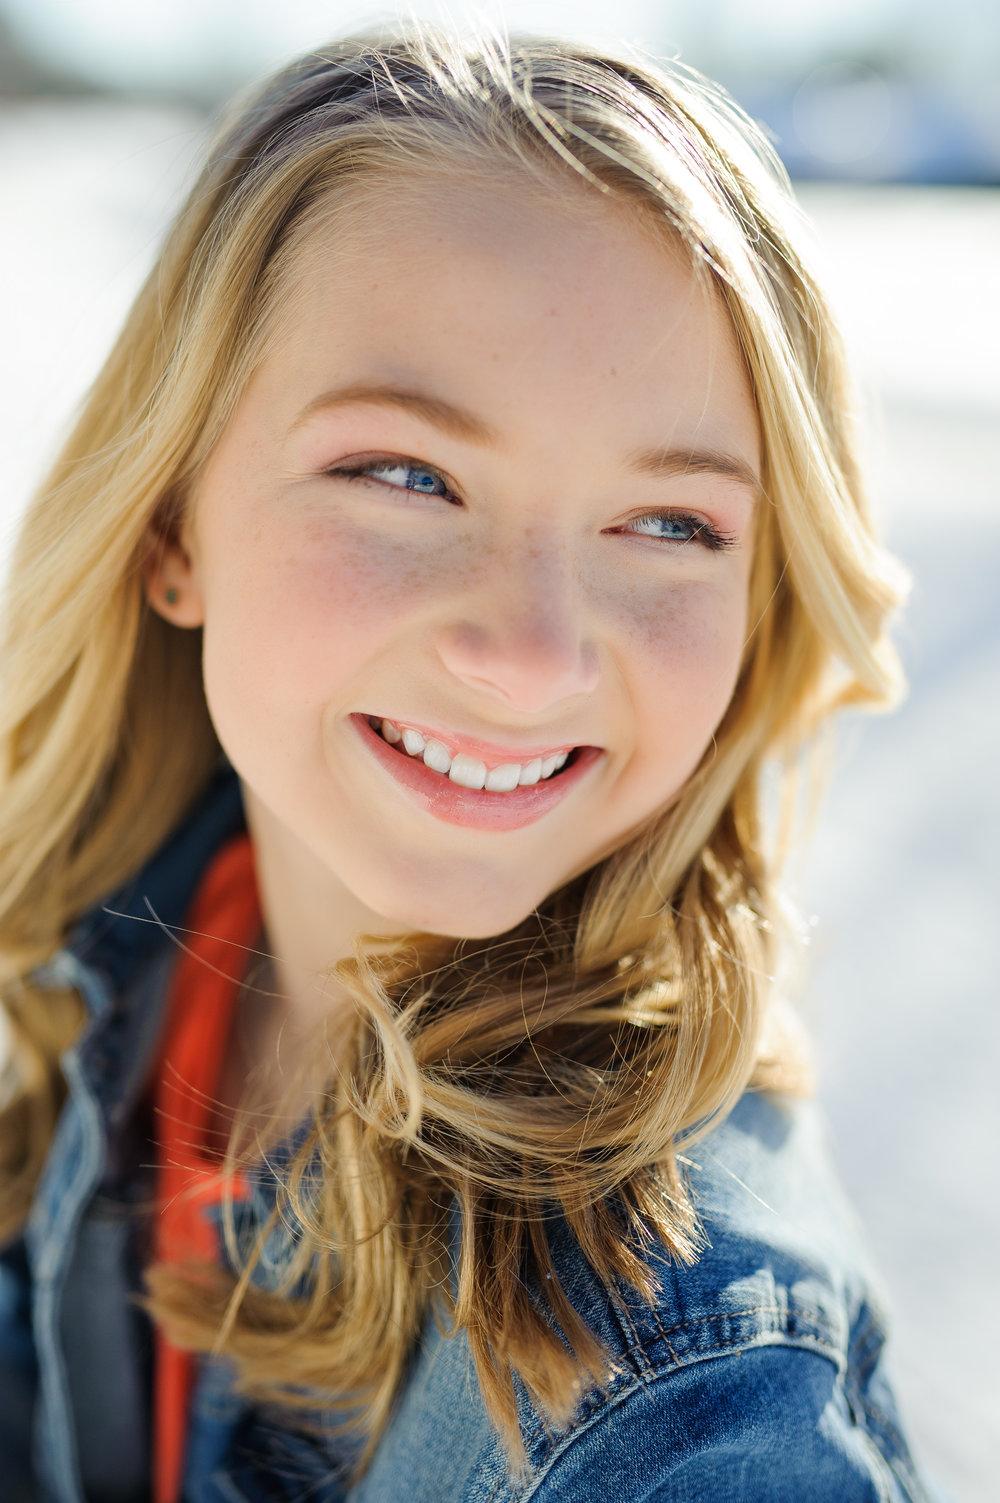 MA-teen-actress-headshot-Abigail-2.jpg